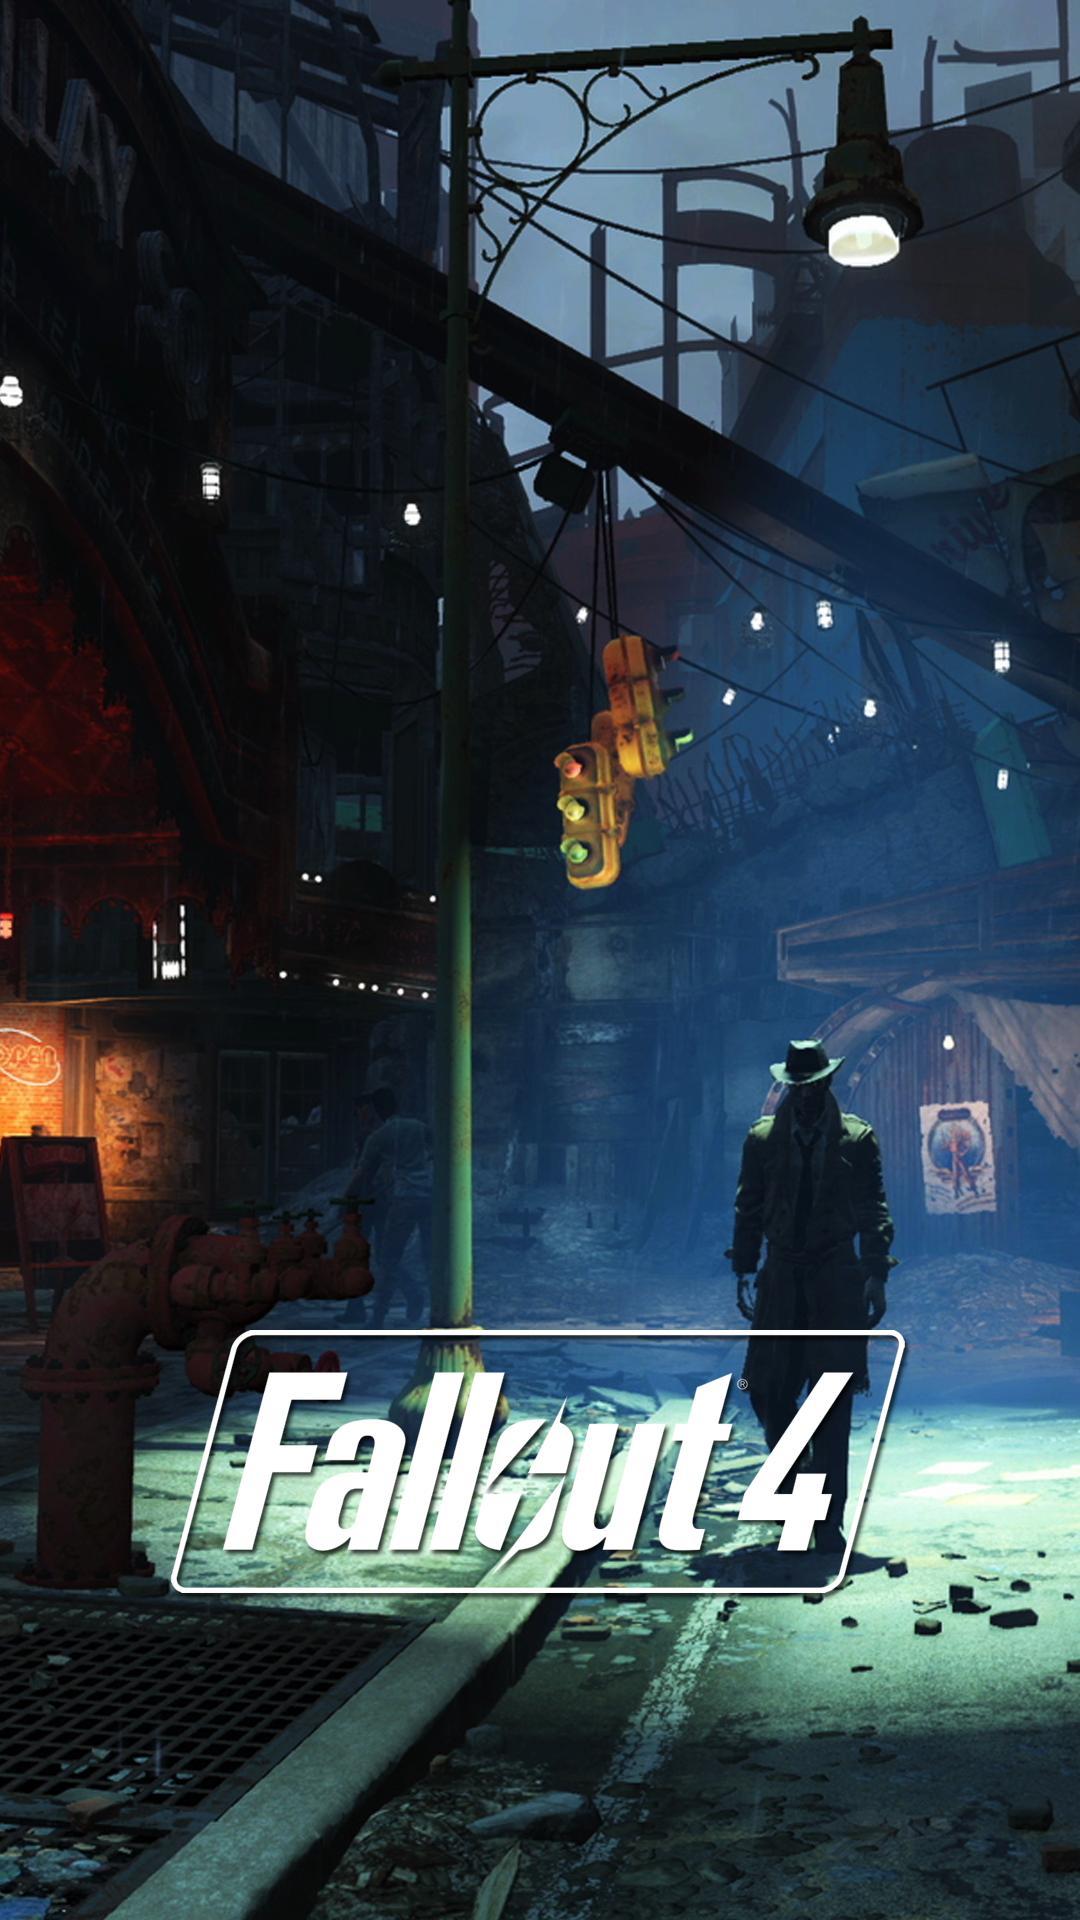 wallpaper 6 fallout - photo #35